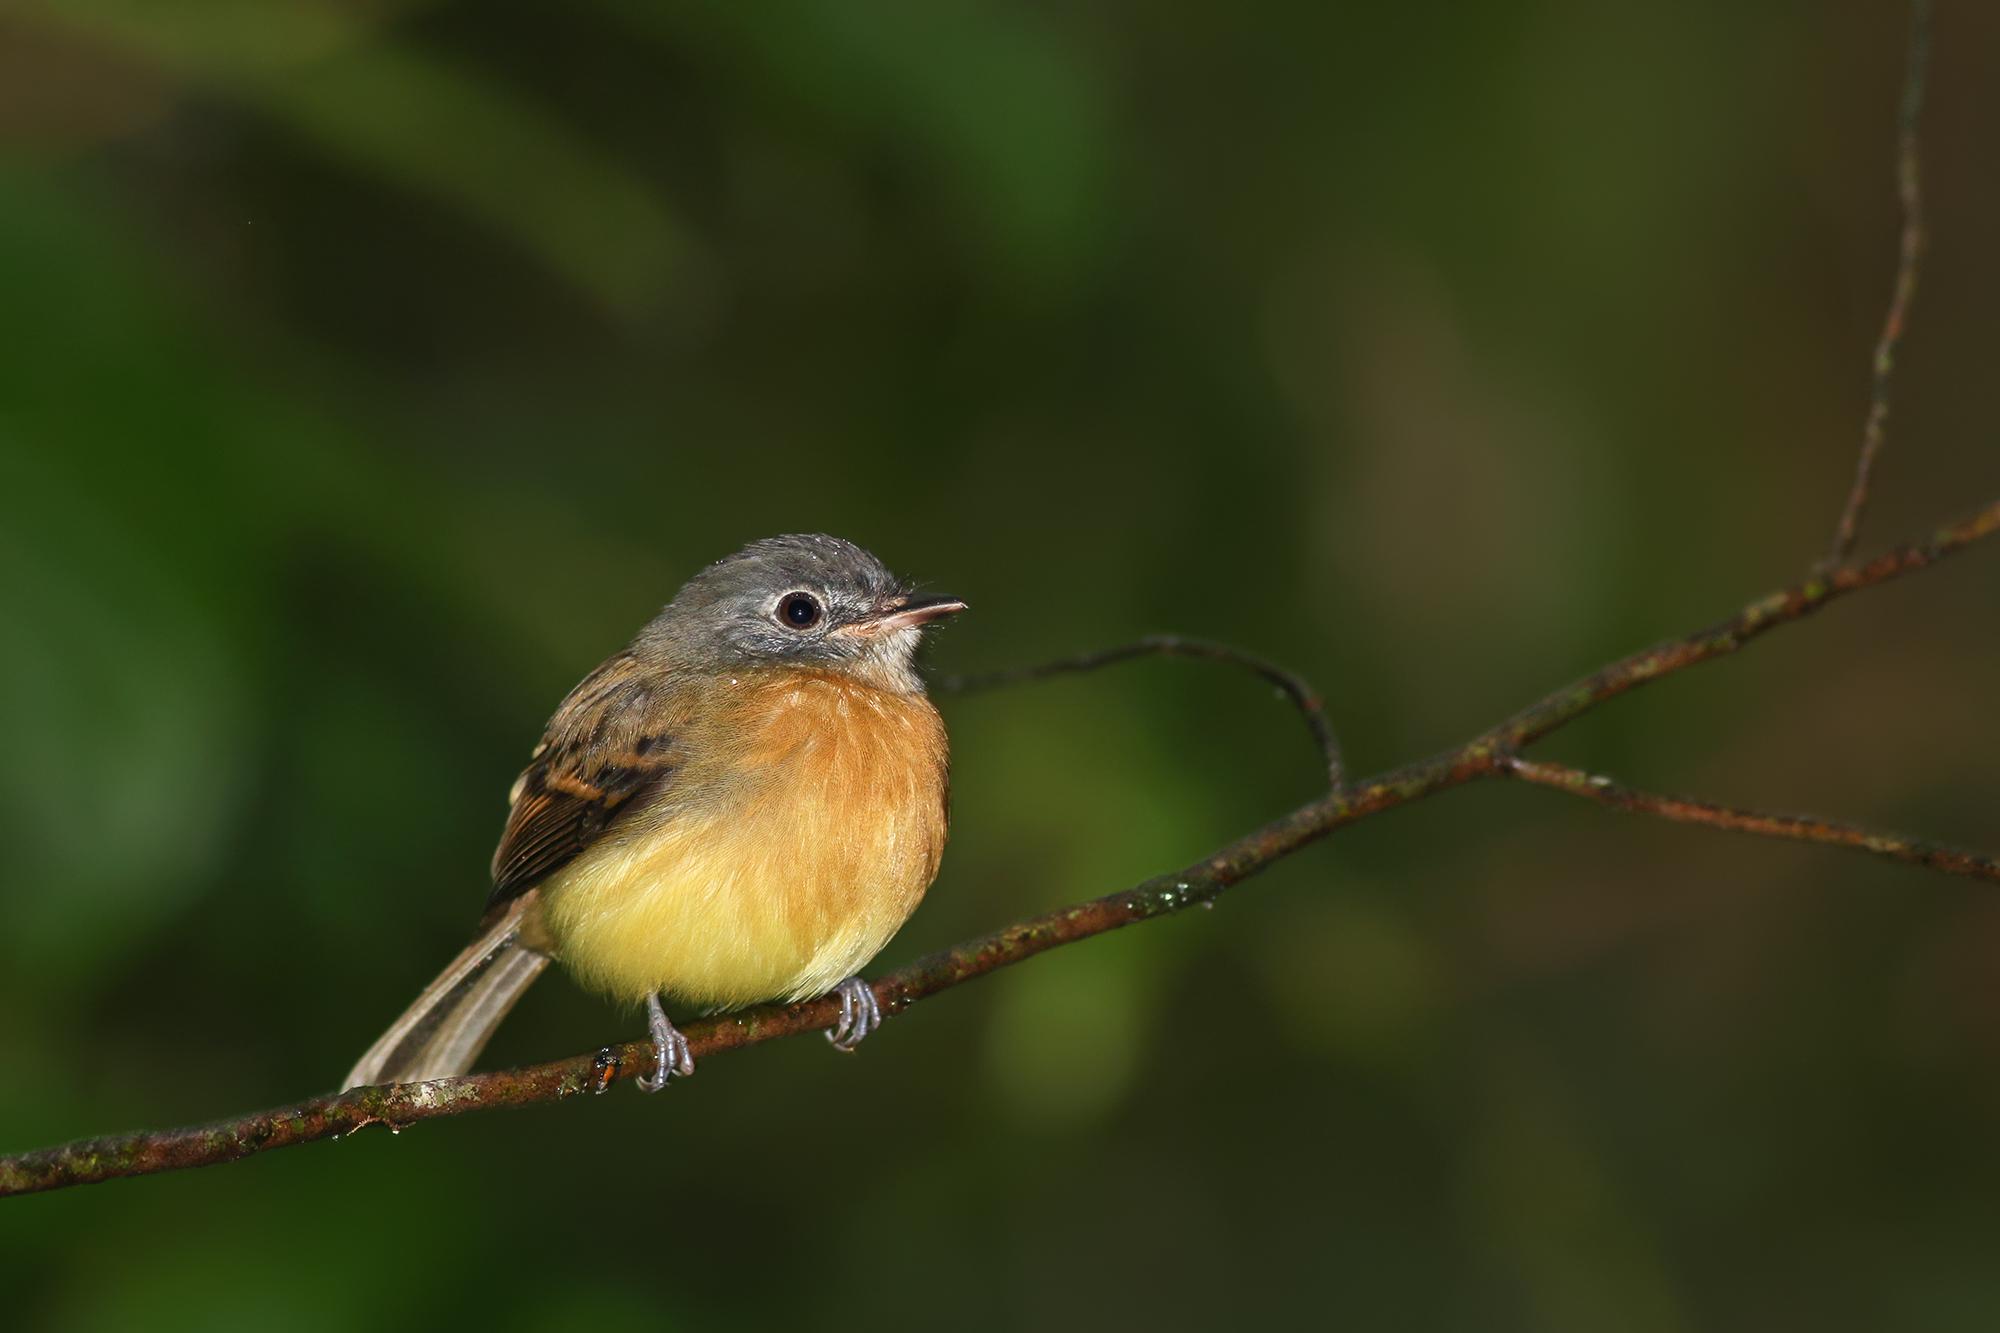 Chestnut-breasted-Flycatcher-JPEG_web .jpg